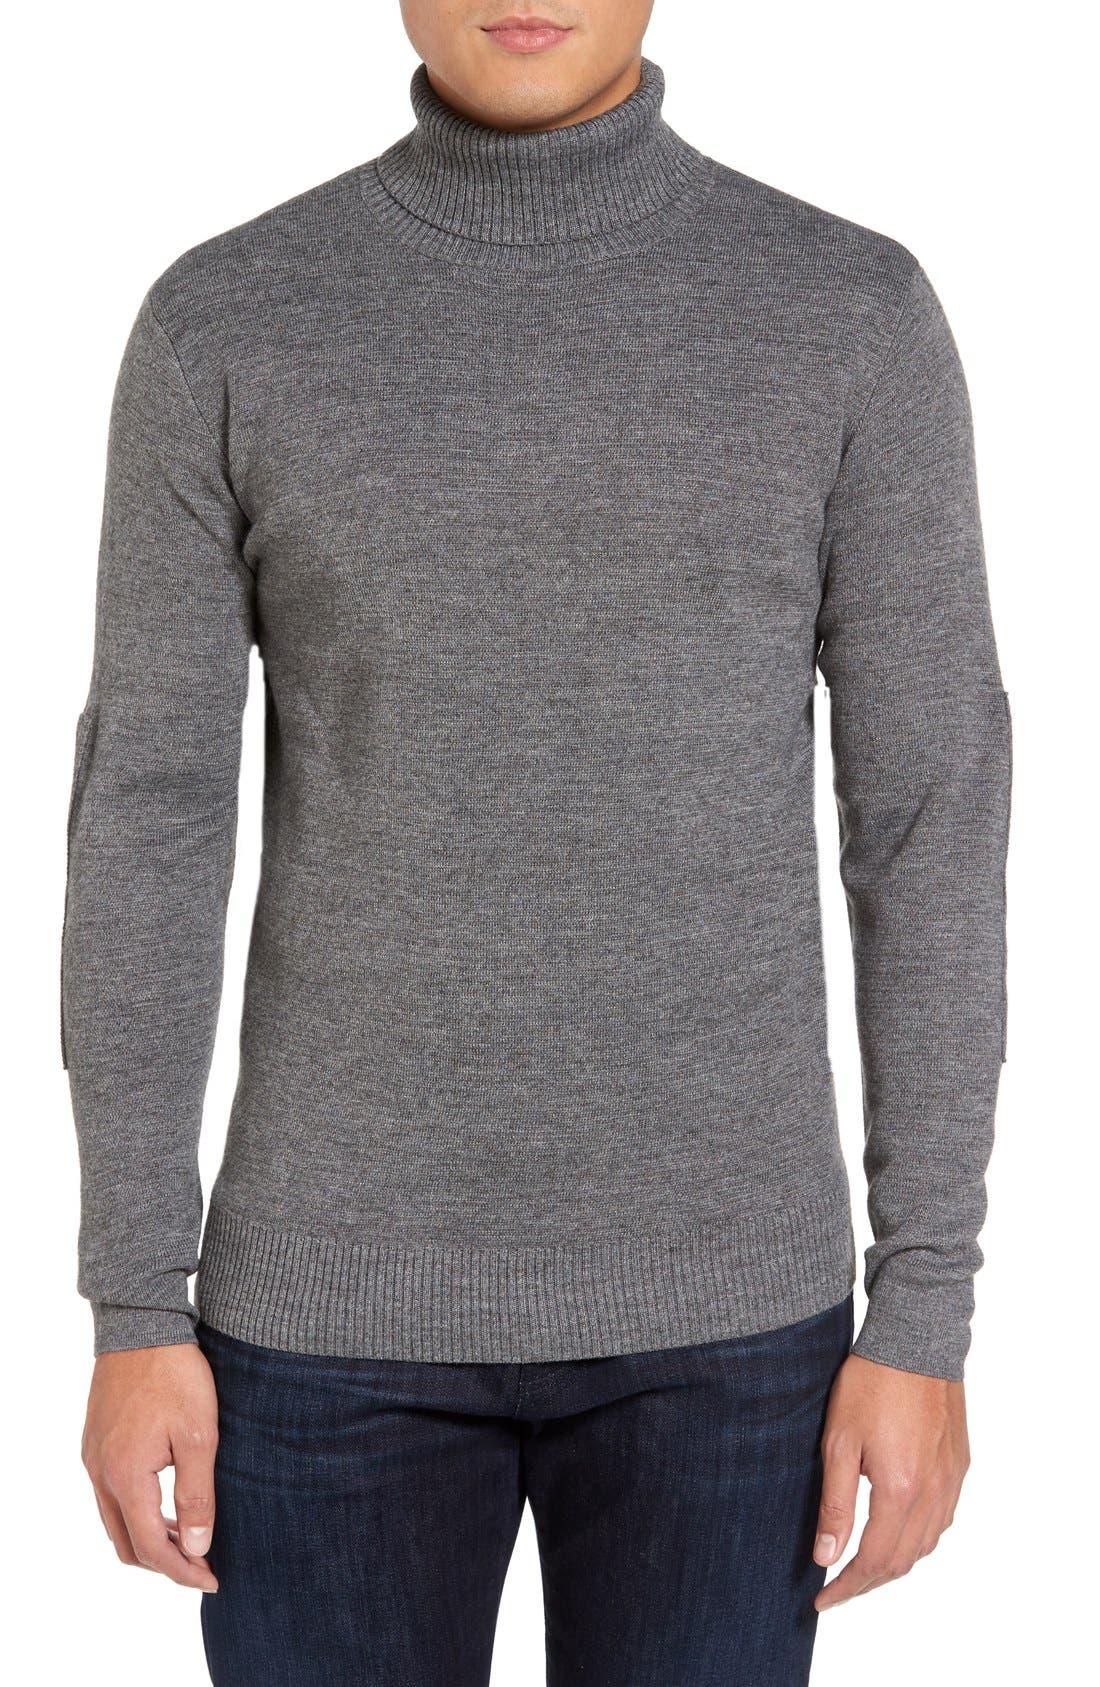 Alternate Image 1 Selected - Slate & Stone Merino Wool Blend Turtleneck Sweater